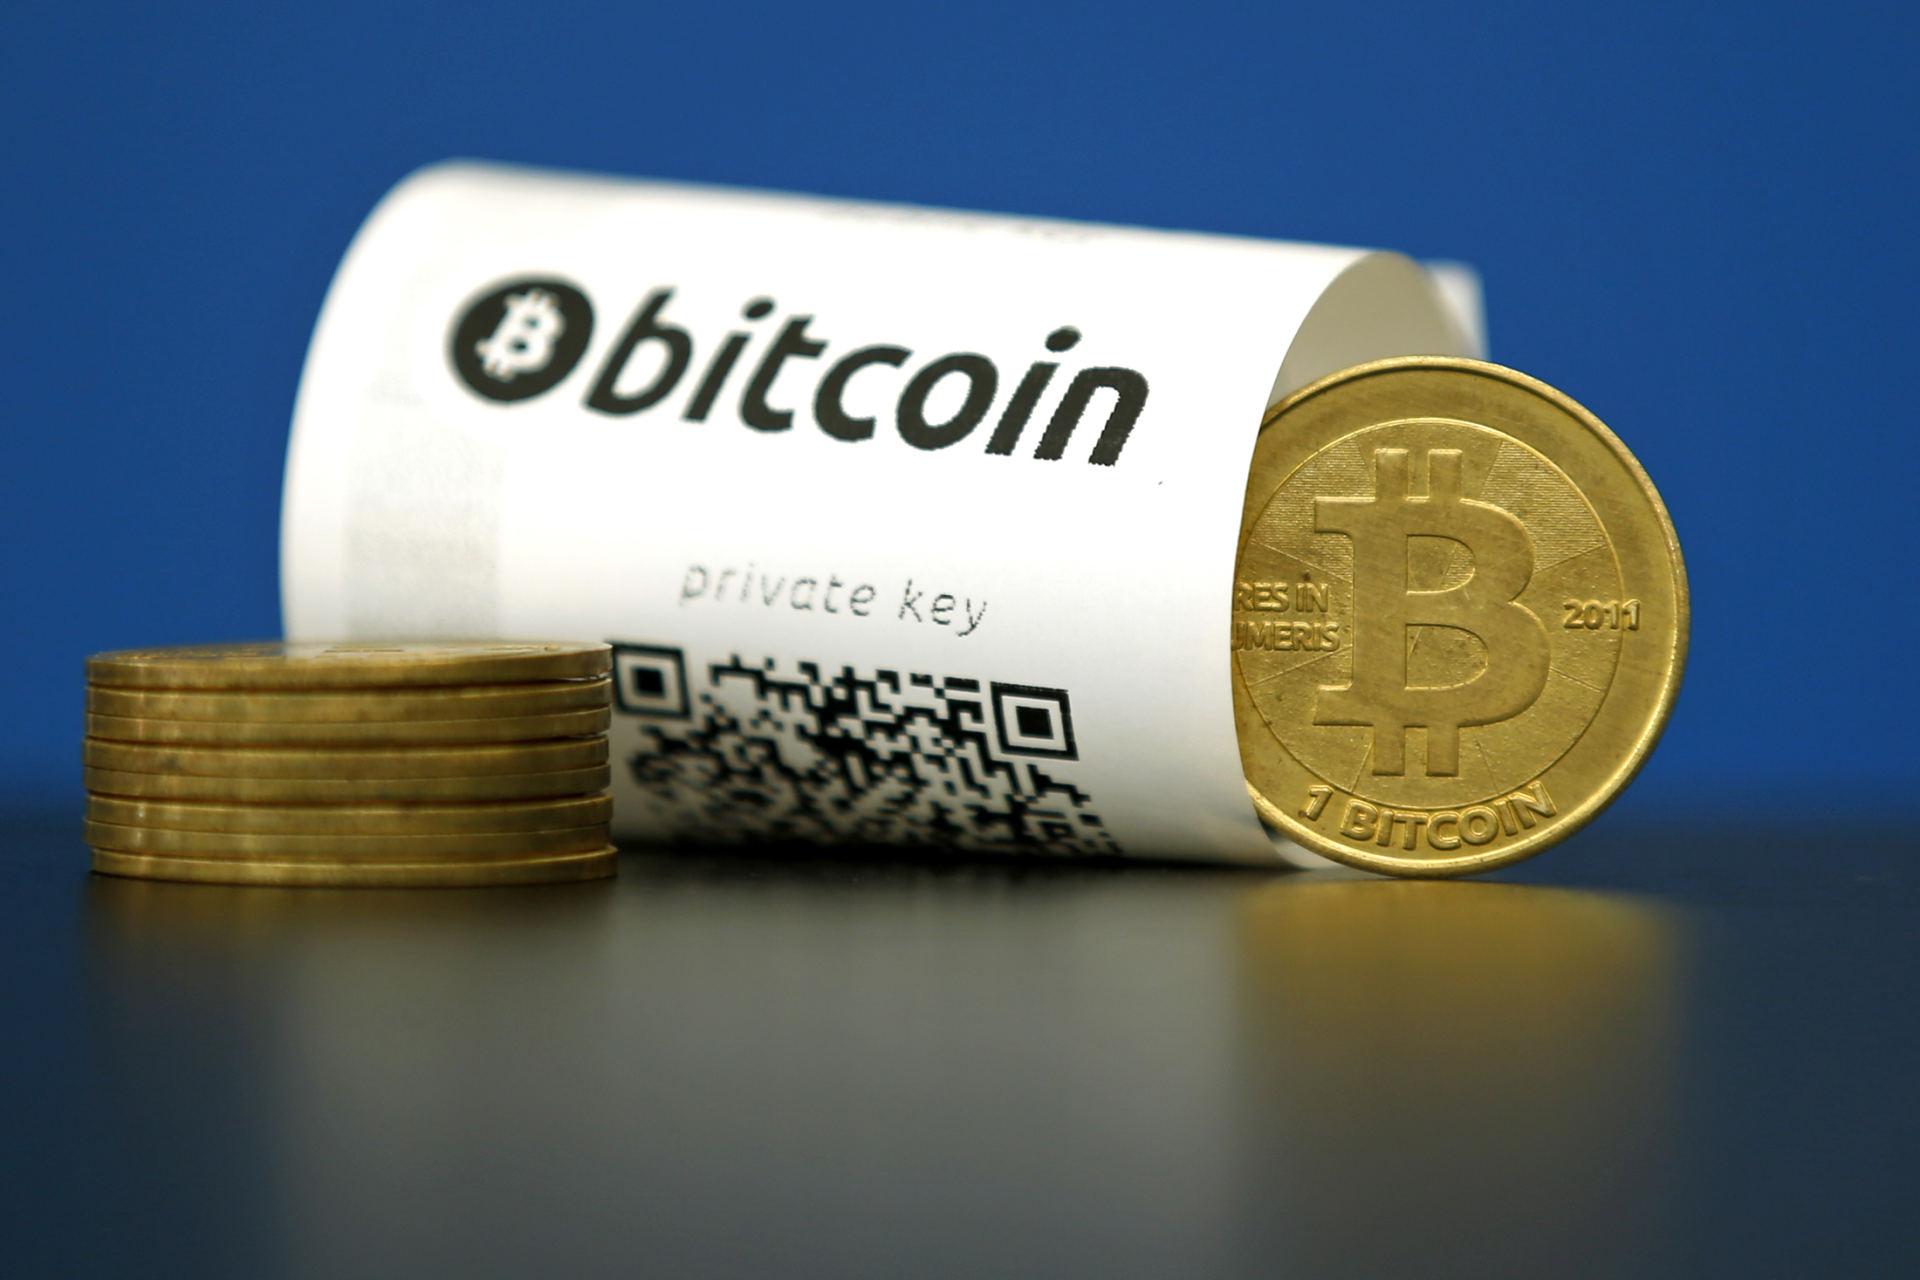 Bitcoin kursas per mėnesį. Bitkoino kursas per savaitę smuko 40 proc.